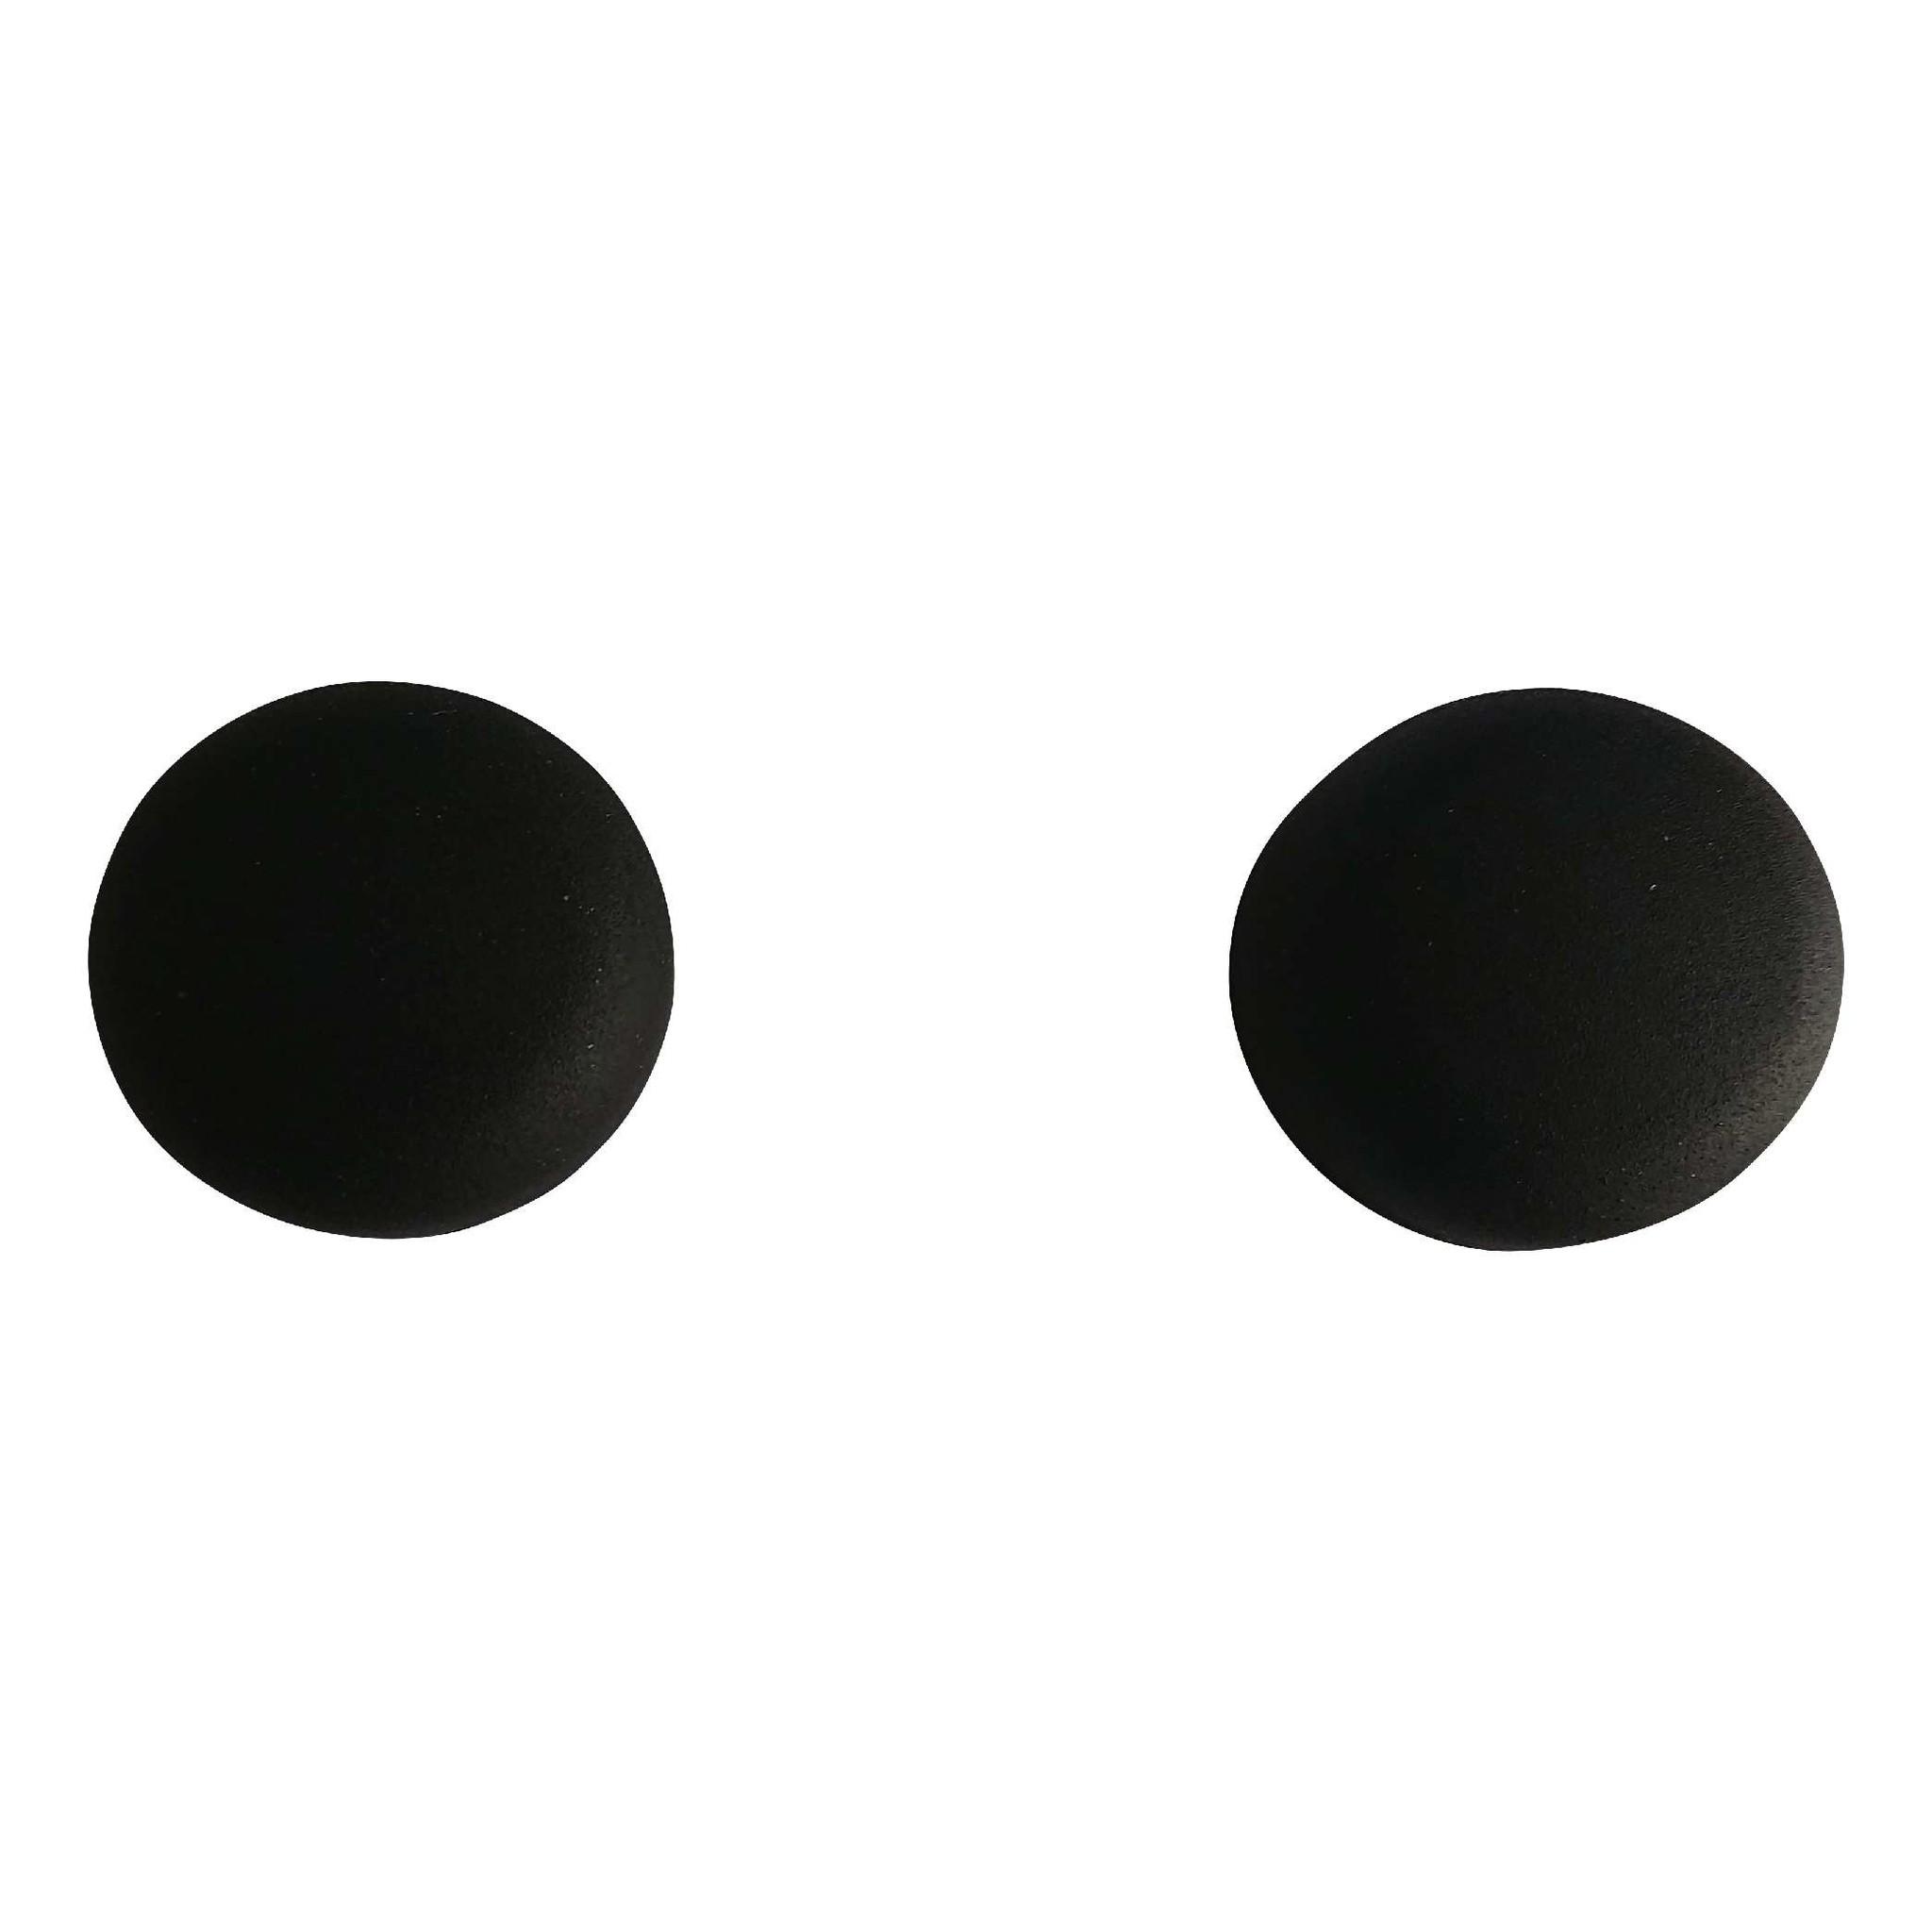 Wheelzahead Black cover caps rear wheel